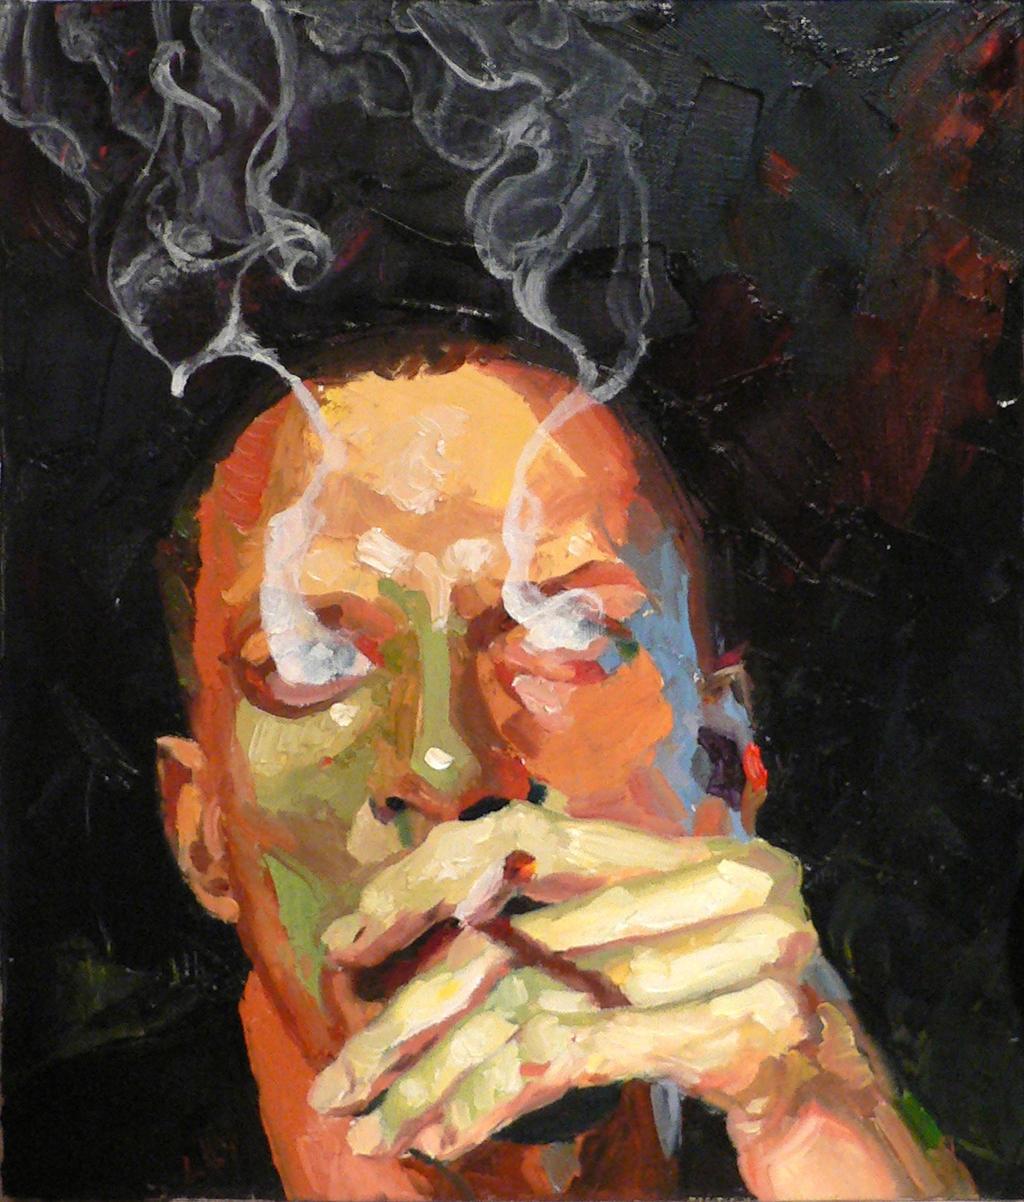 Smoke (self-portrait) by bfaupin